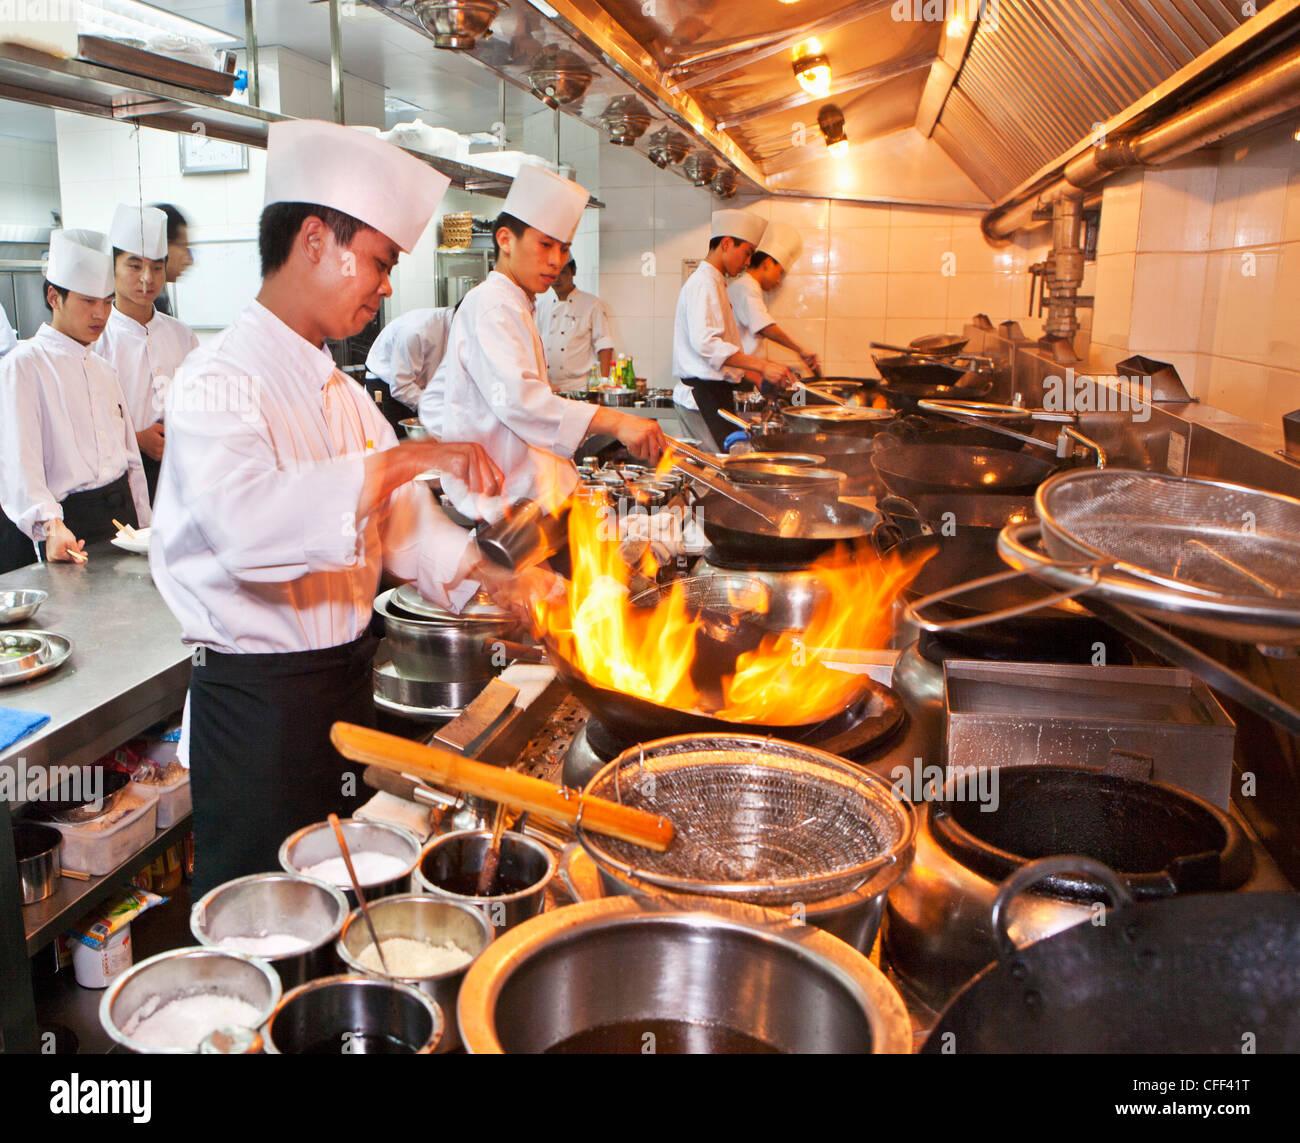 Chefs Preparing Chinese Cuisine In Woks In The Modern